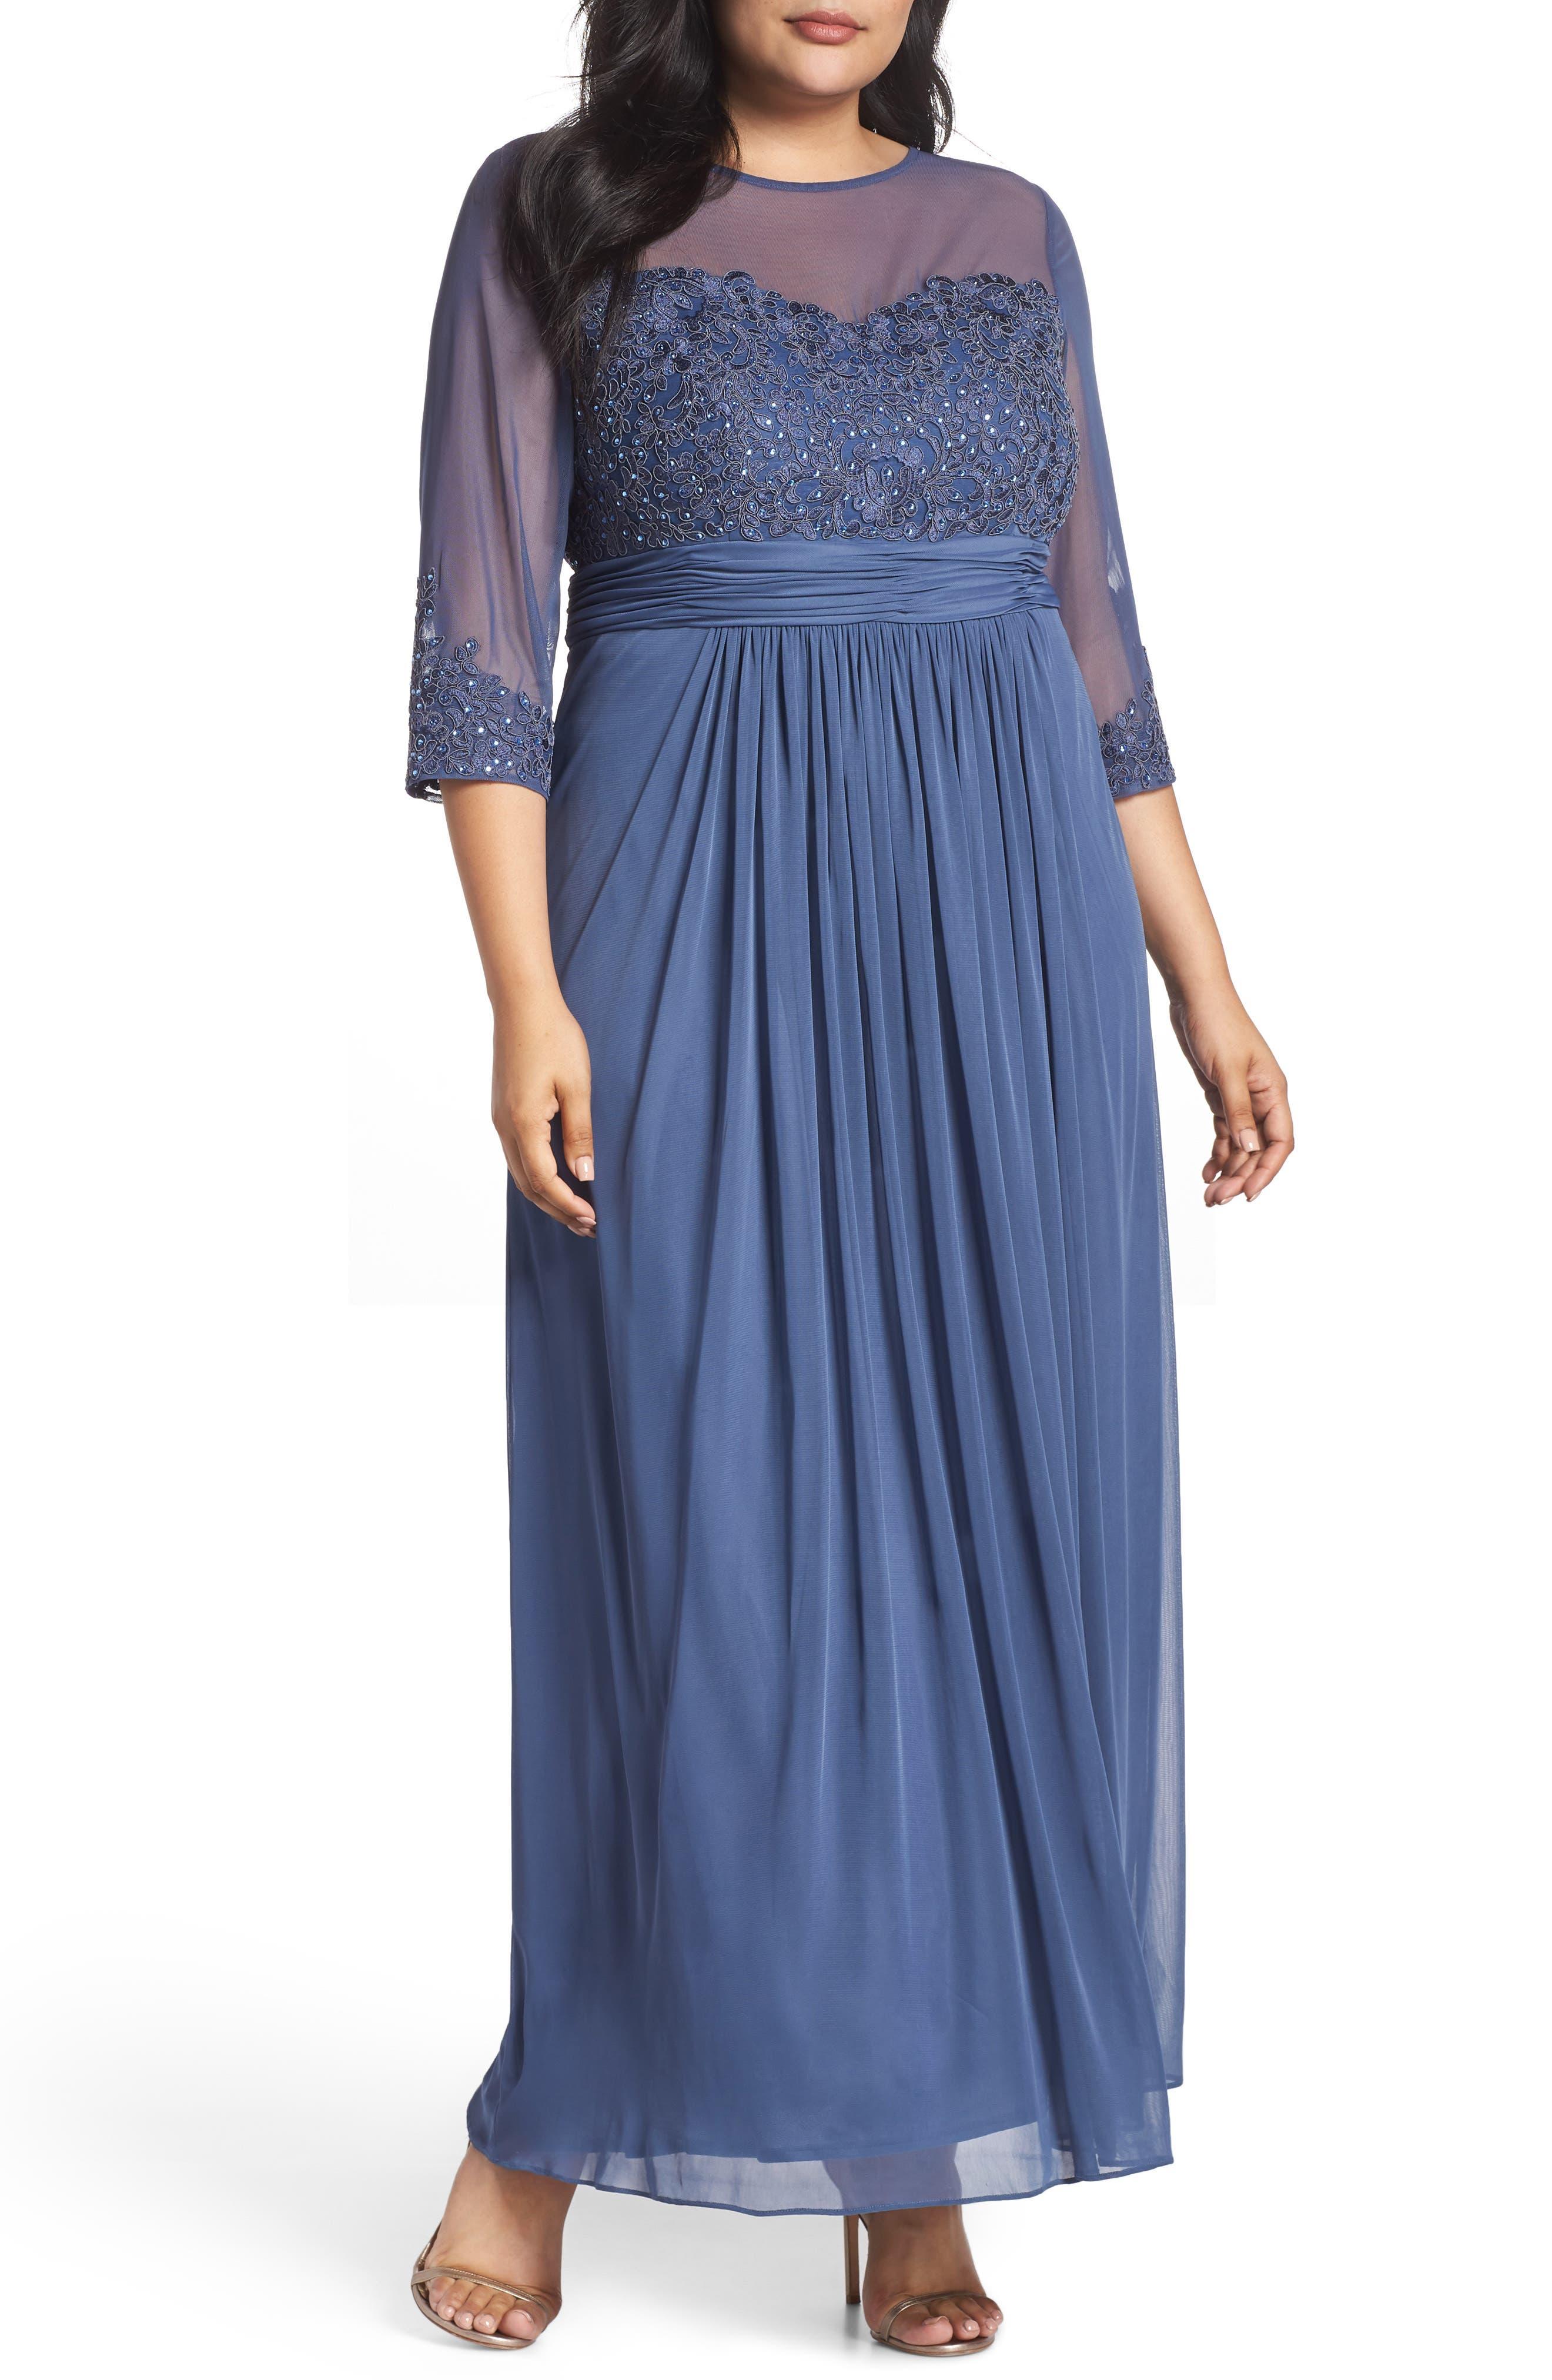 Edwardian Ladies Clothing – 1900, 1910s, Titanic Era Plus Size Womens Alex Evenings Embellished Illusion Sweetheart A-Line Gown Size 18W - Purple $279.00 AT vintagedancer.com